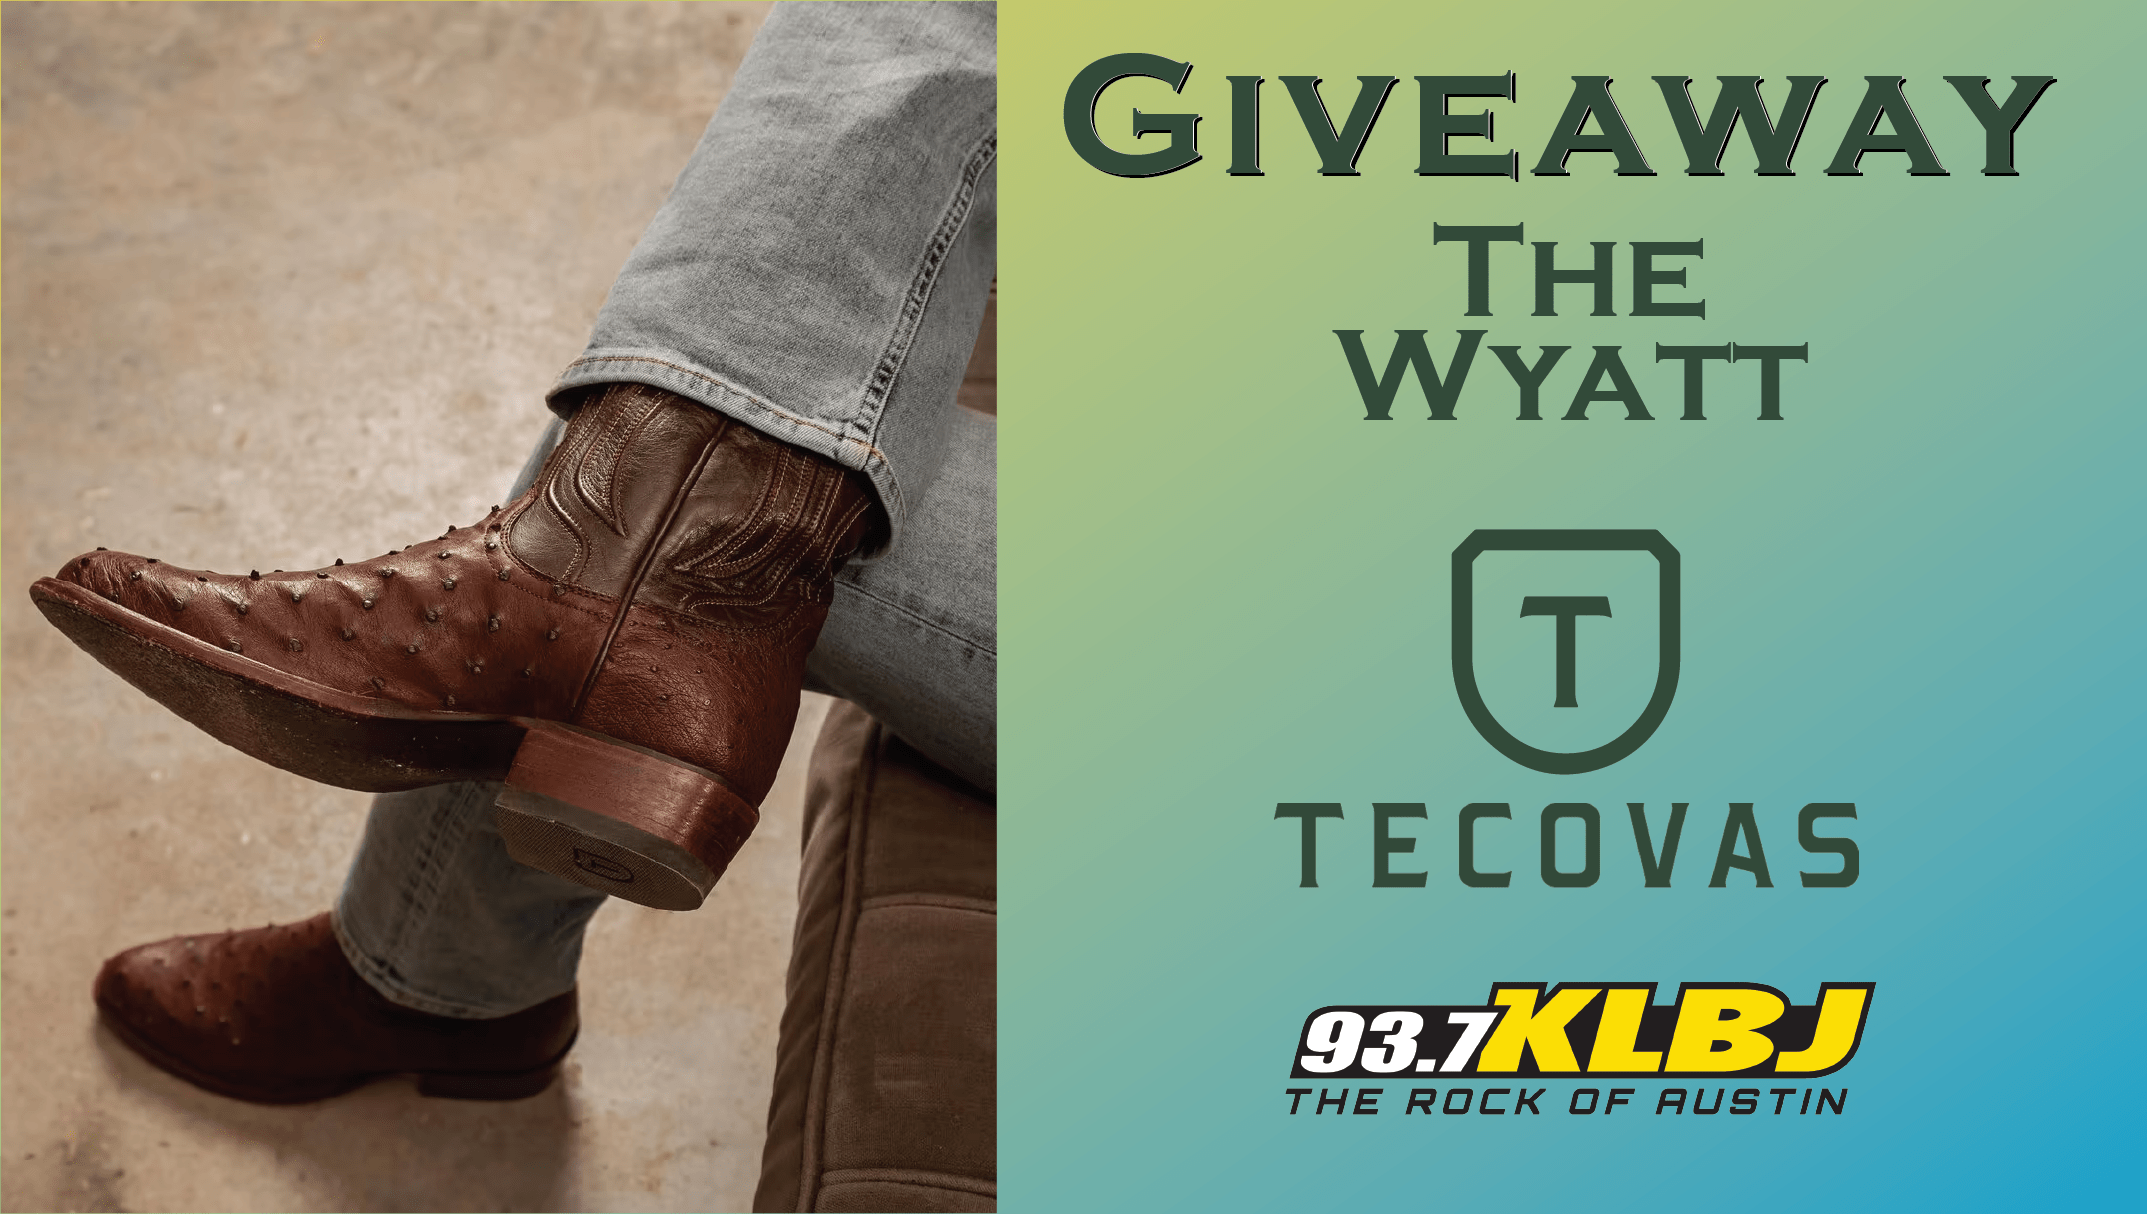 Tecovas the wyatt cowboy boot giveaway from klbjfm